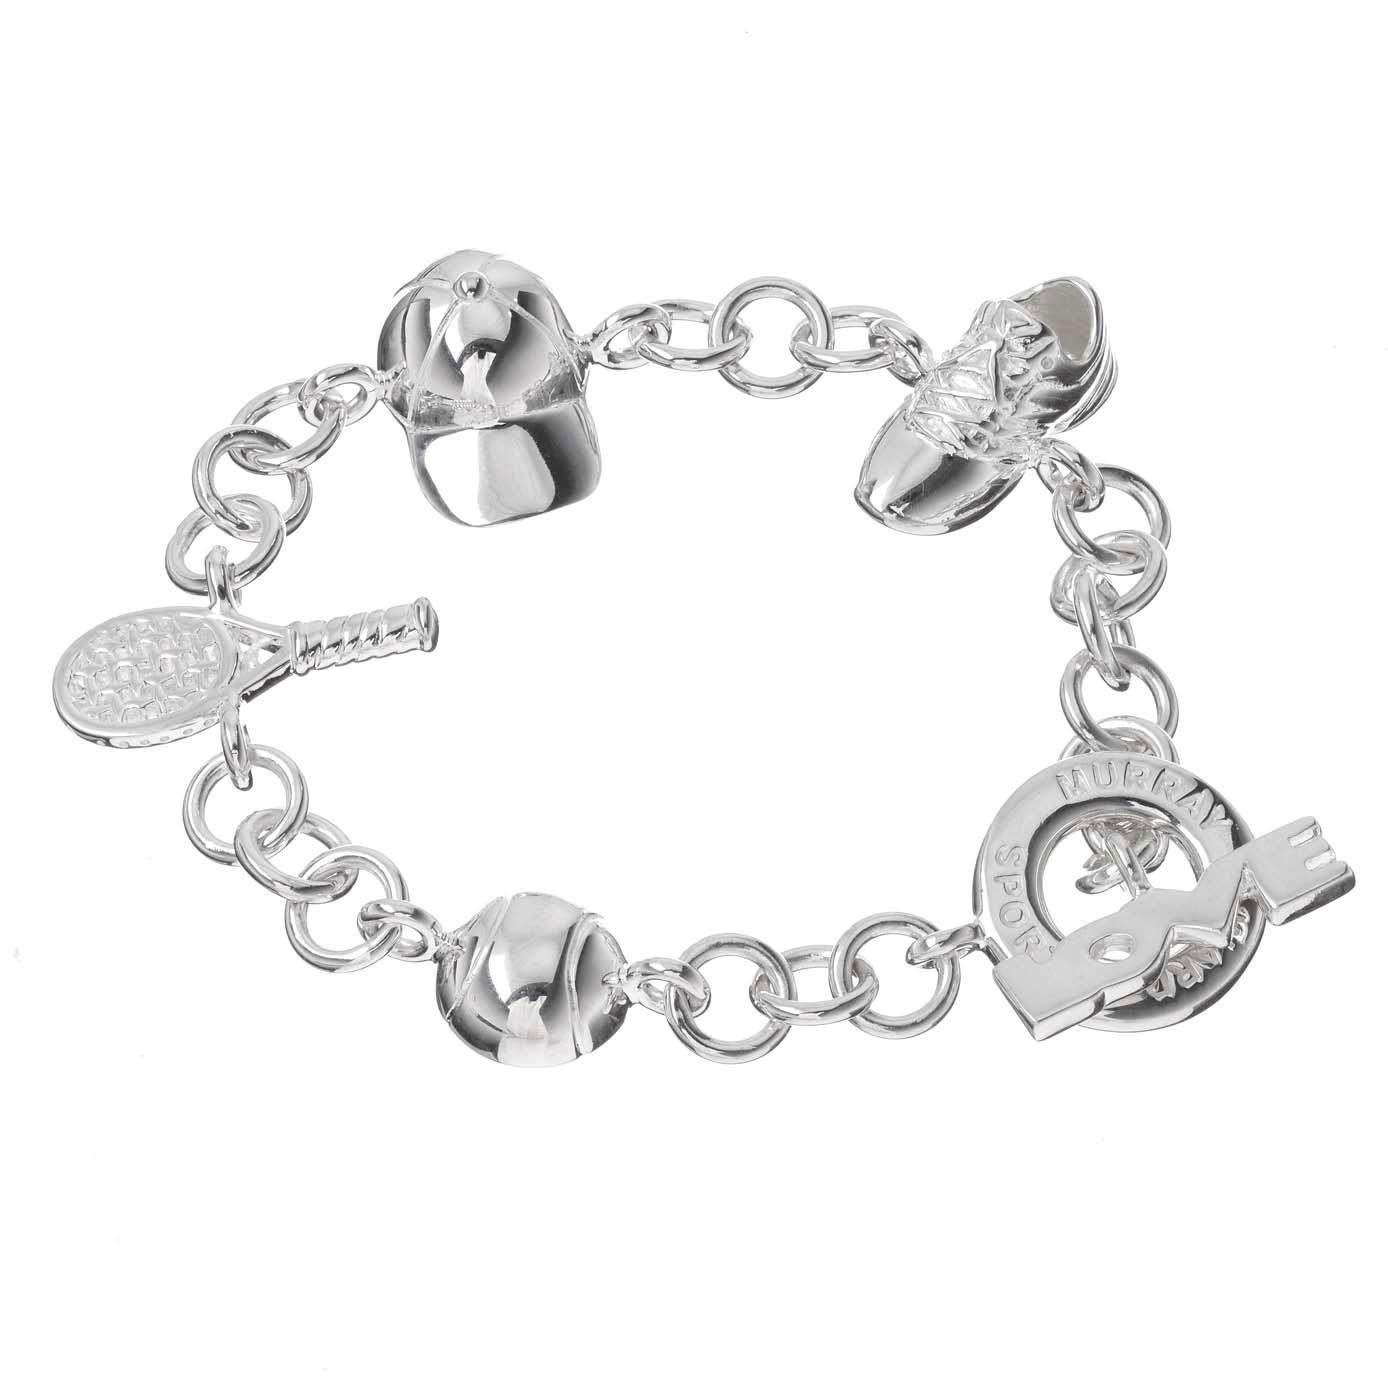 Sterling Silver Tennis Charm Bracelet